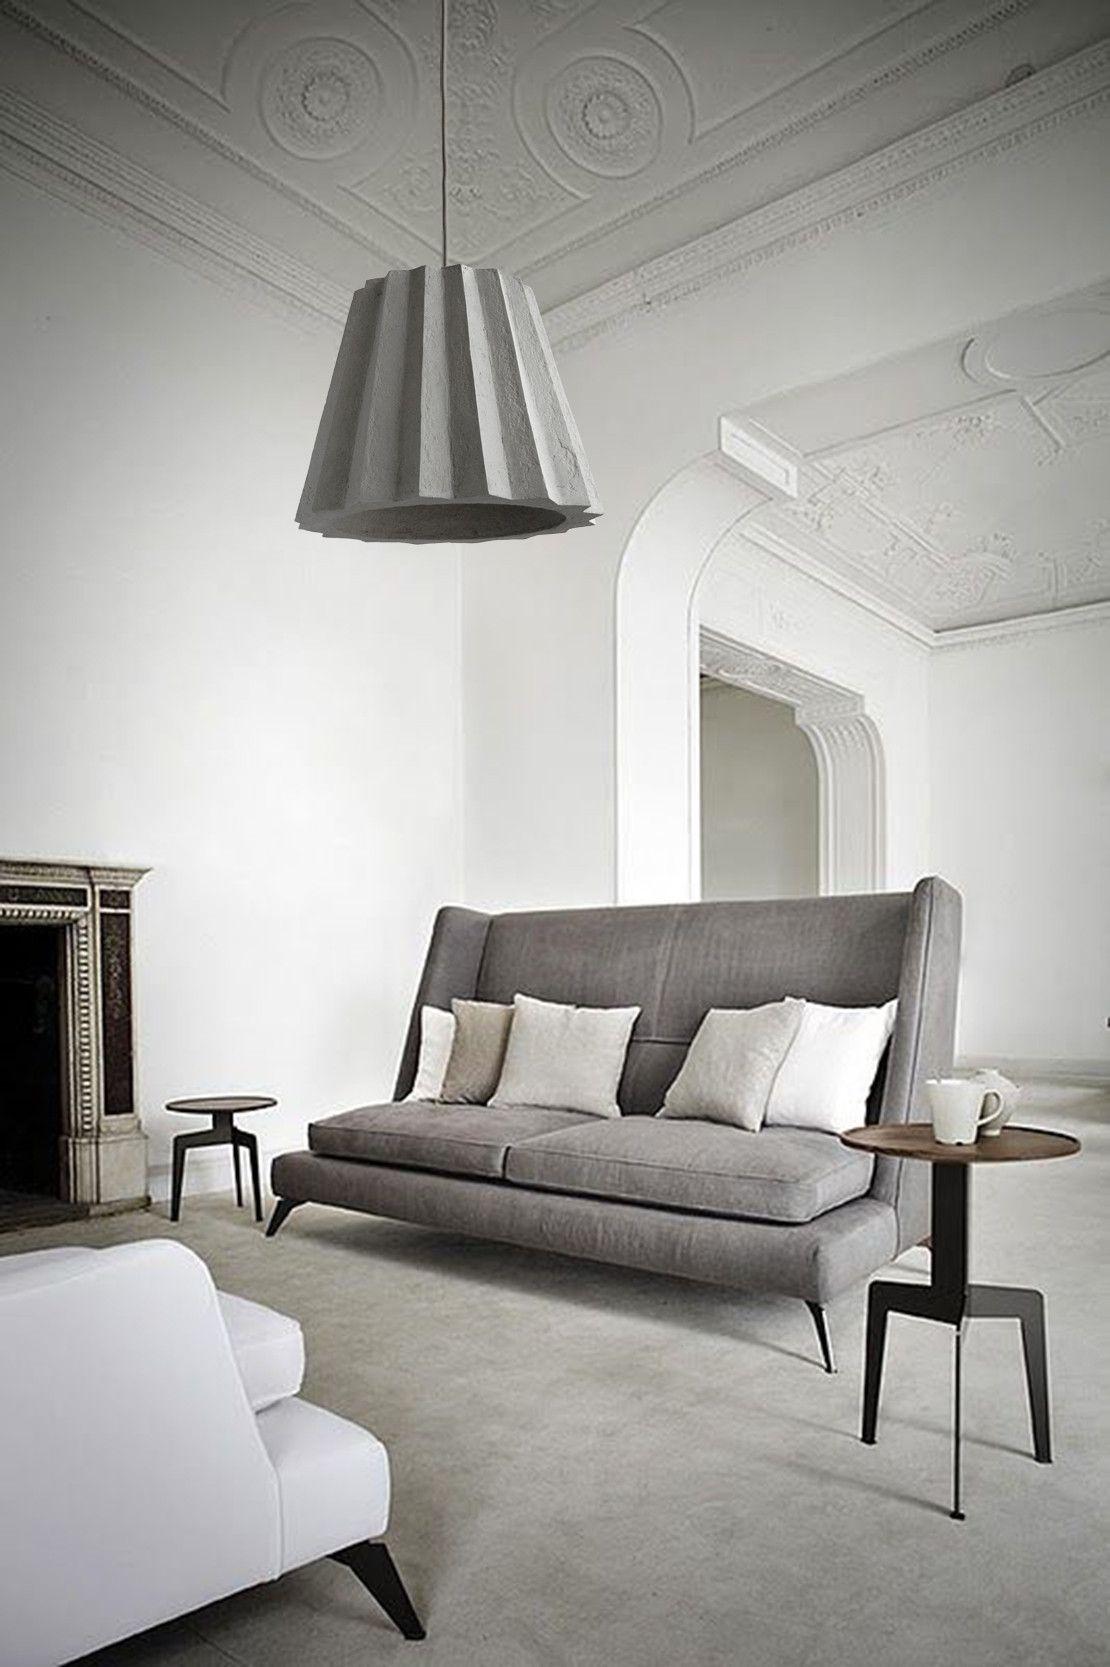 plise lamp 2016 paris design week cc round 2 pinterest. Black Bedroom Furniture Sets. Home Design Ideas